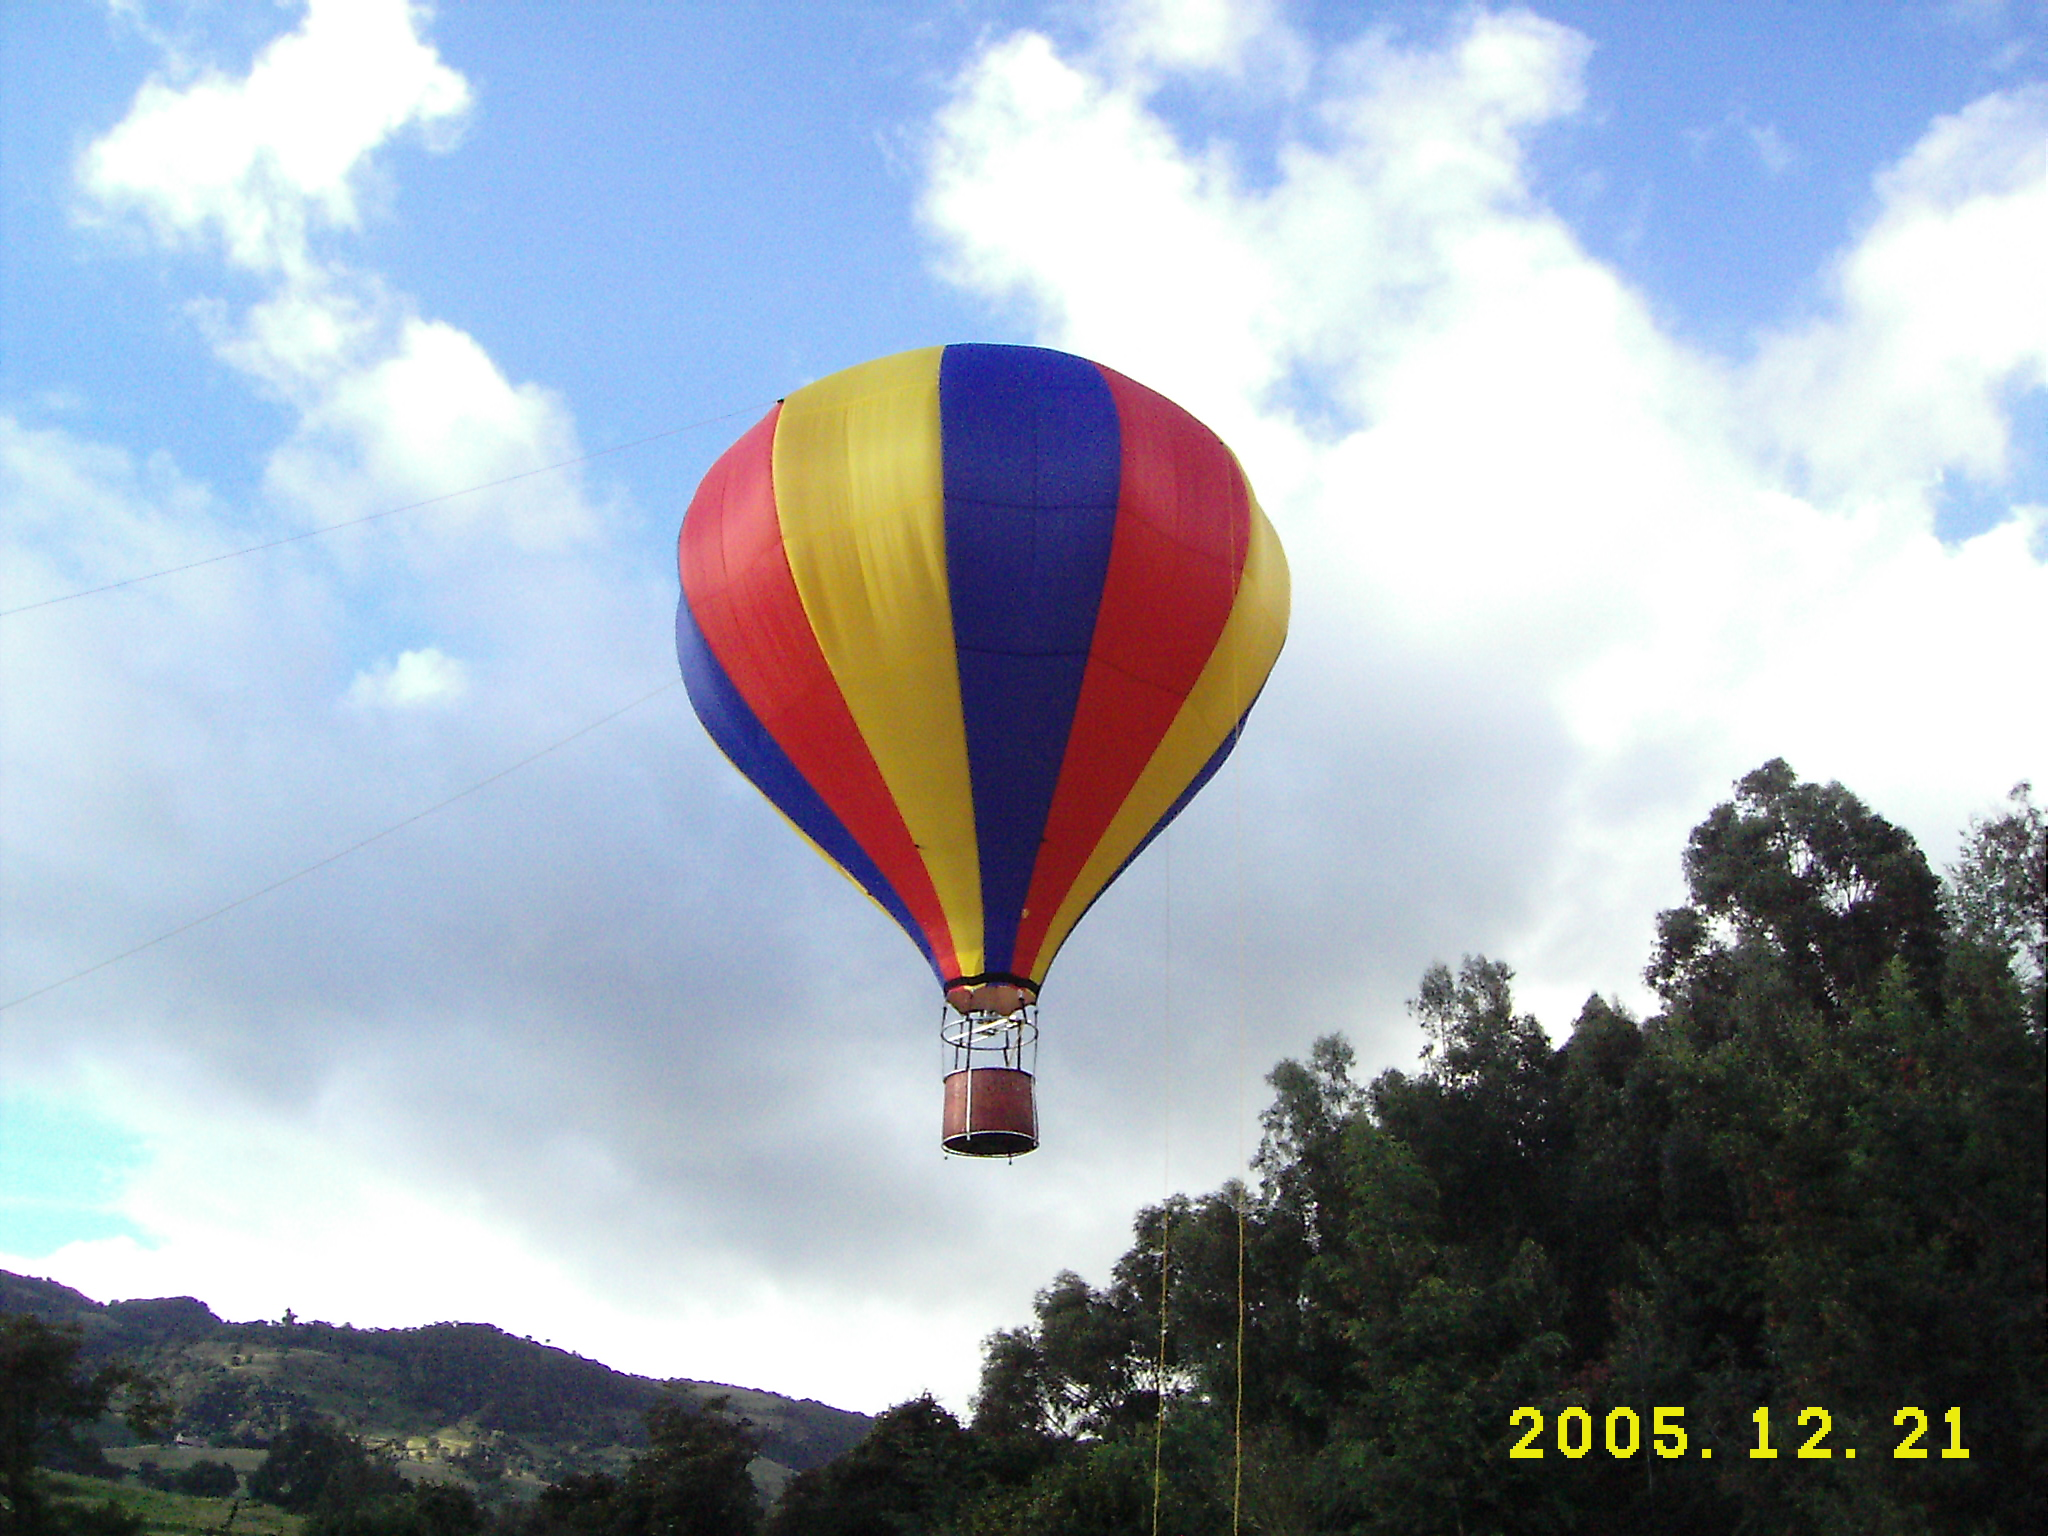 Globos aerostaticos colombia inflables dummies y - Globos aerostaticos infantiles ...